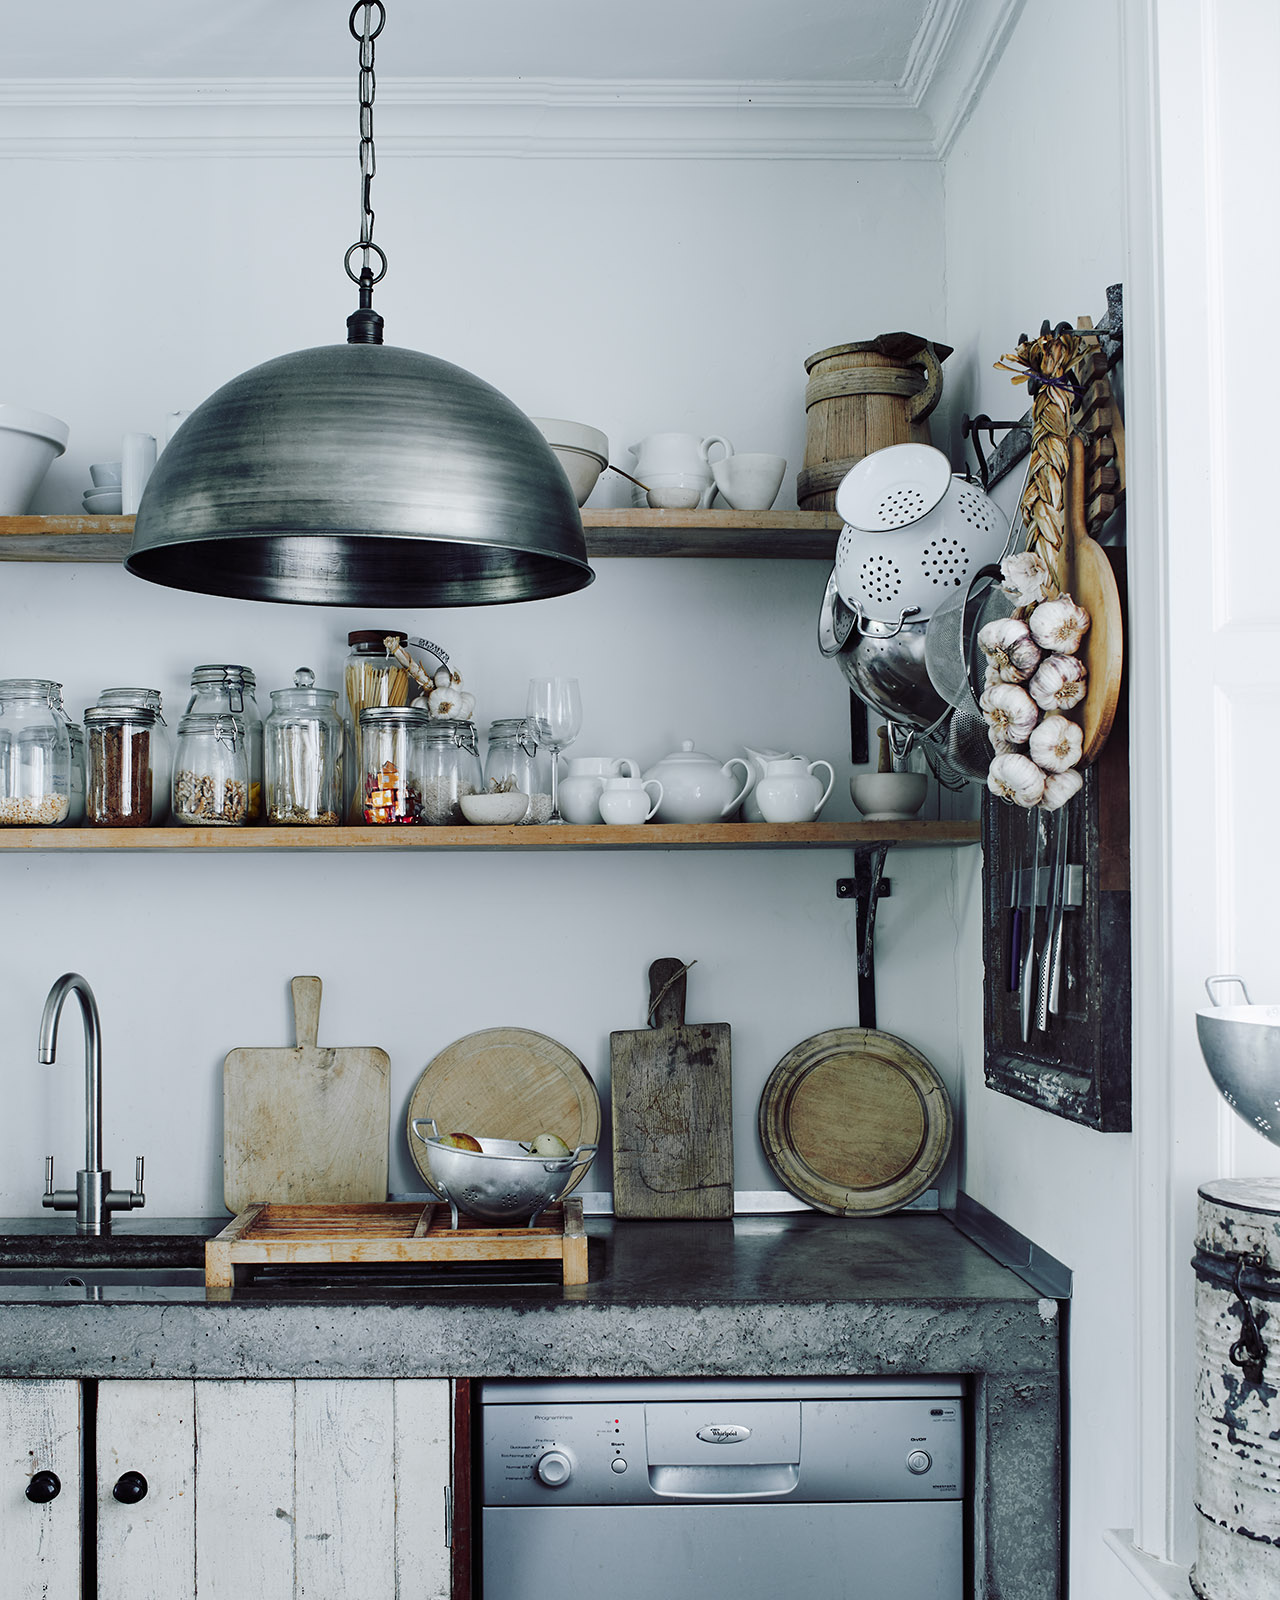 141017-SLM-Home-Kitchen-006-web-1600-px.jpg